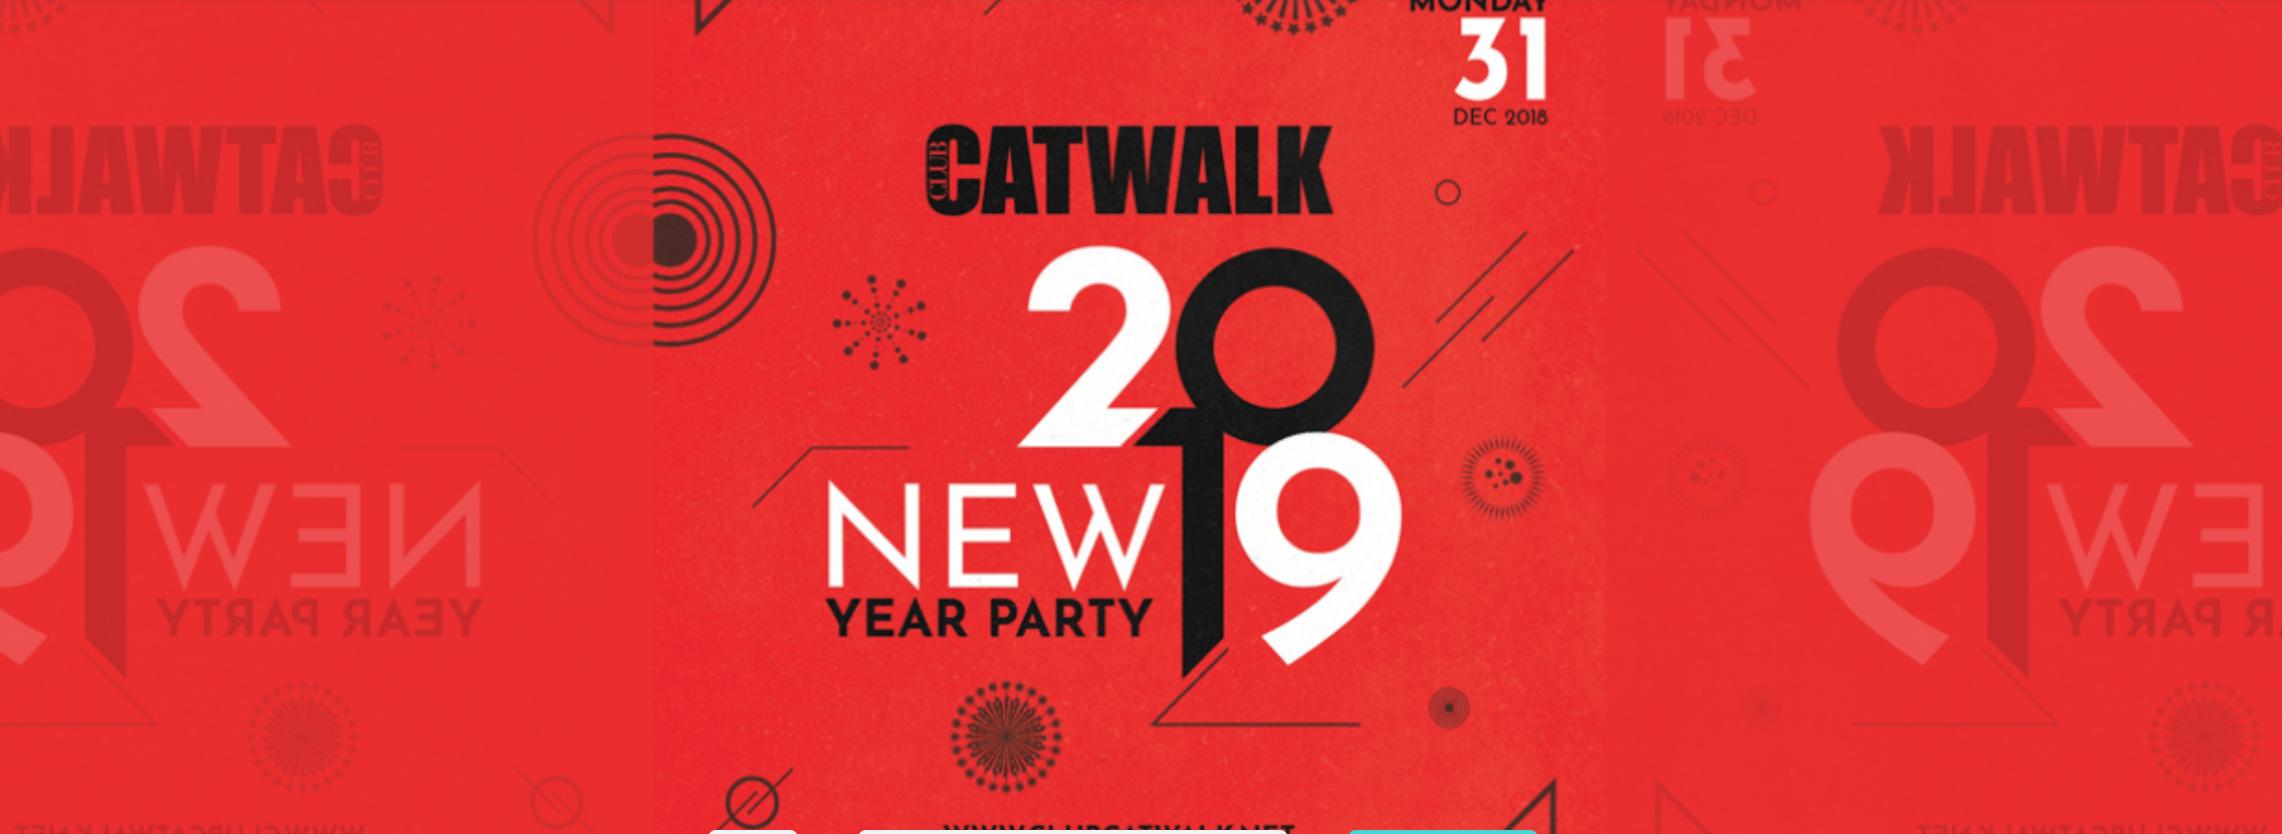 AÑO NUEVO 2019 - CATWALK CATWALK